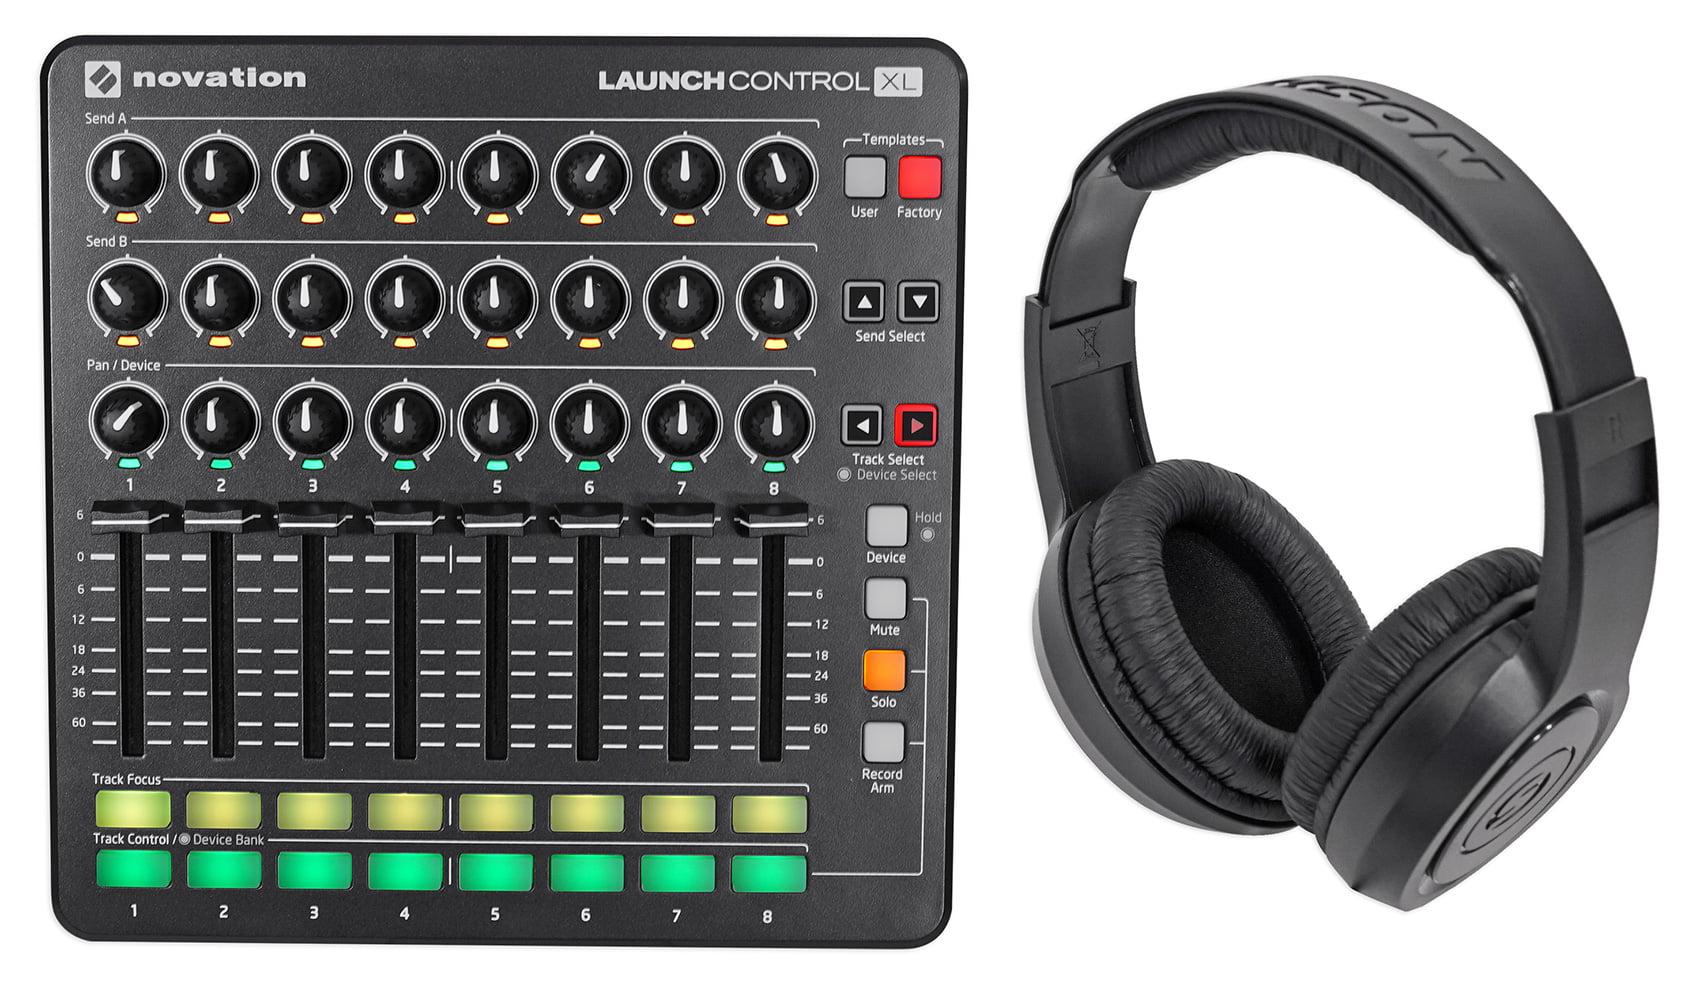 Novation Launch Control XL MIDI USB Ableton Live Controller + Samson Headphones by NOVATION